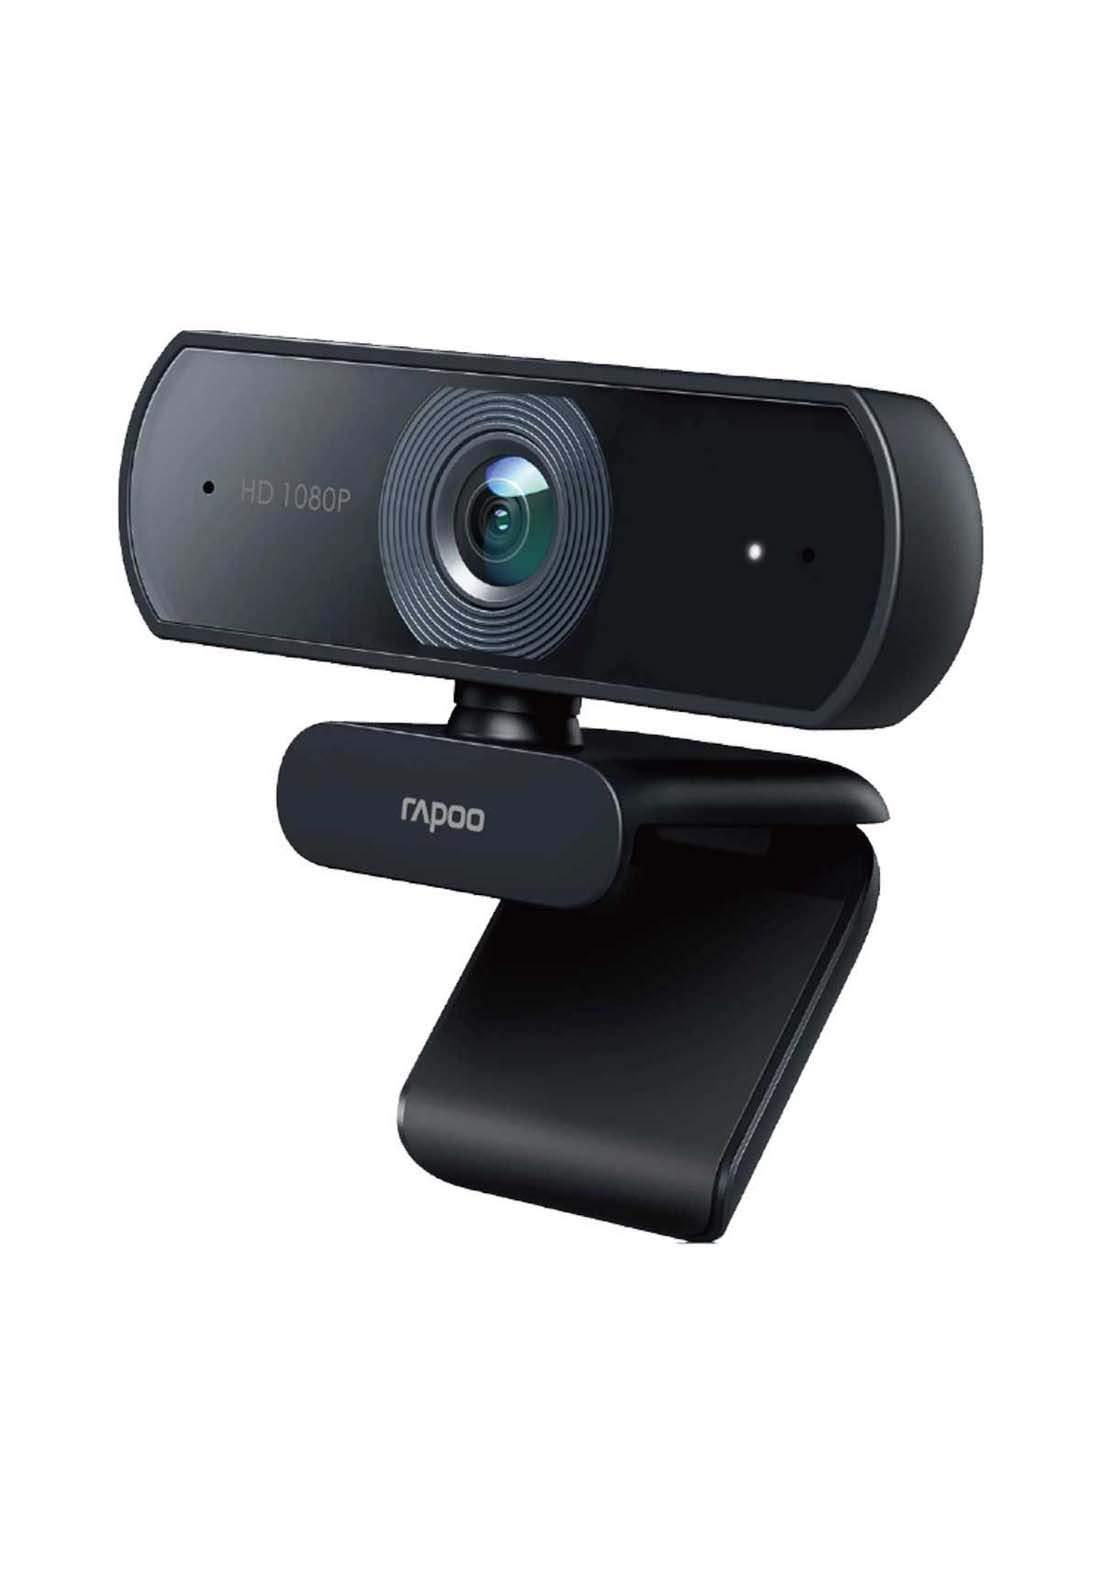 Rapoo C260 USB 1080p Full HD Webcam - Black كاميرا